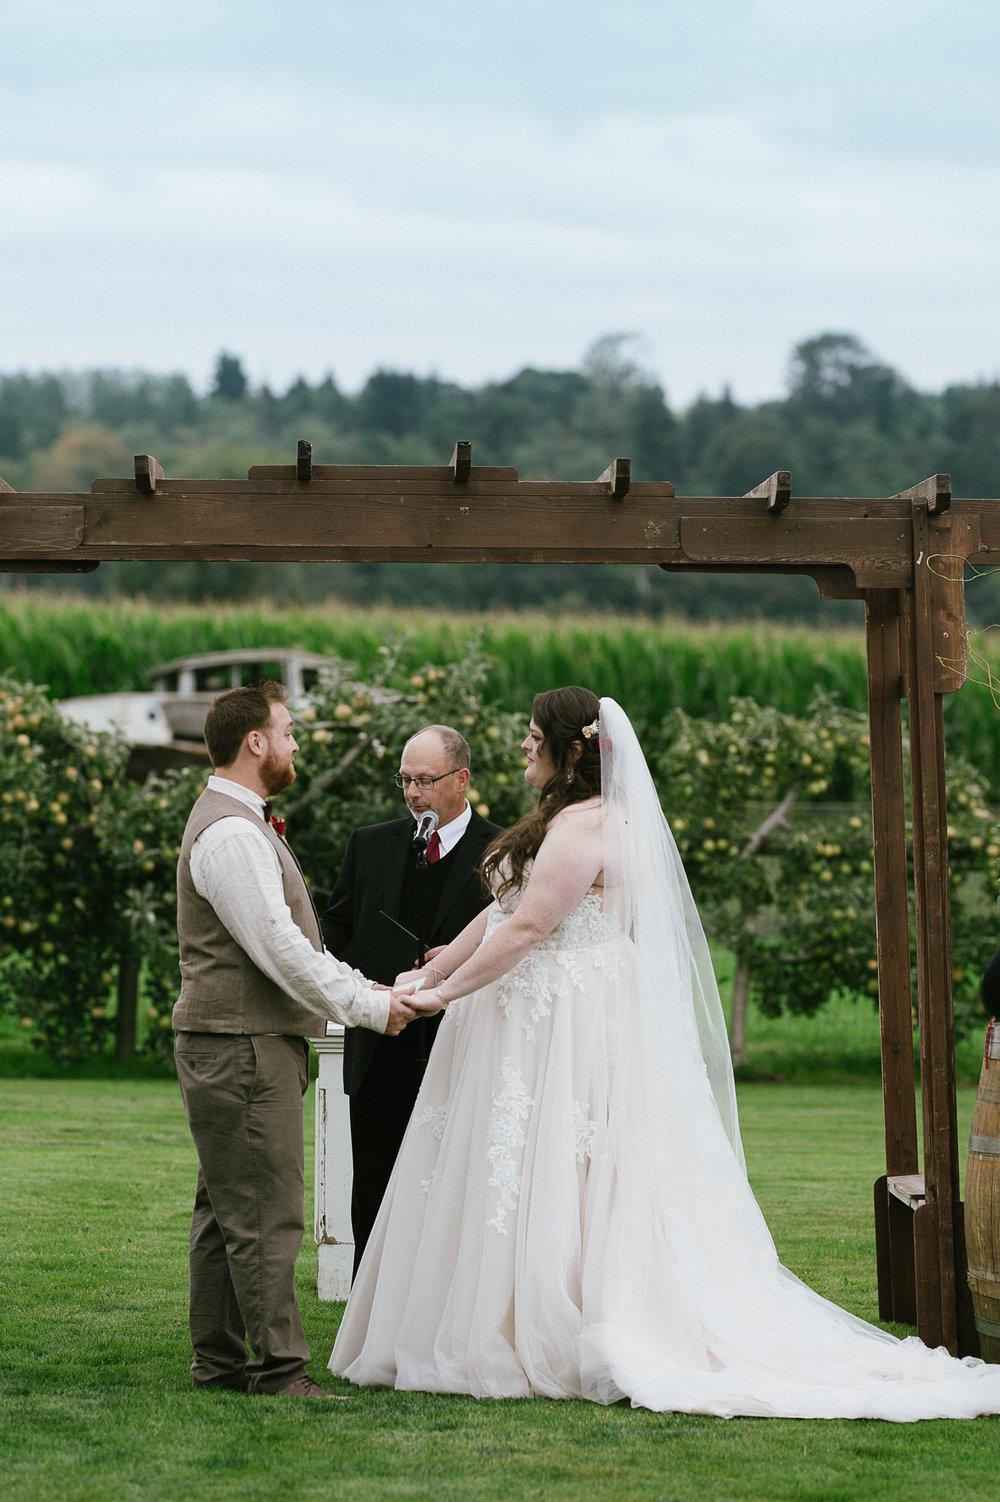 Swan Trail Farm Wedding_Sarah Schurman + Brian Skadan_Snohomish Wedding_Kelsey Lane Photography-6072.jpg